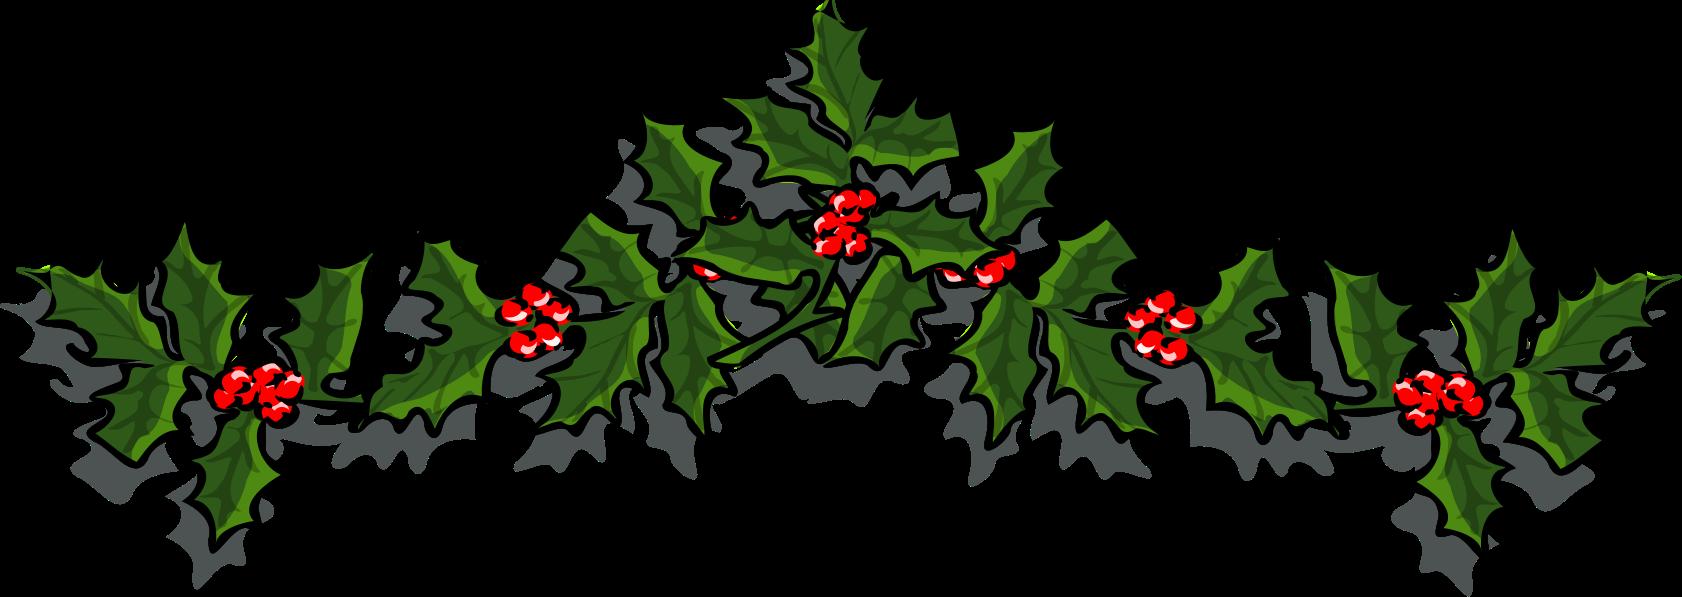 Holley clipart holiday Holly Holly Holiday Holiday Clipart